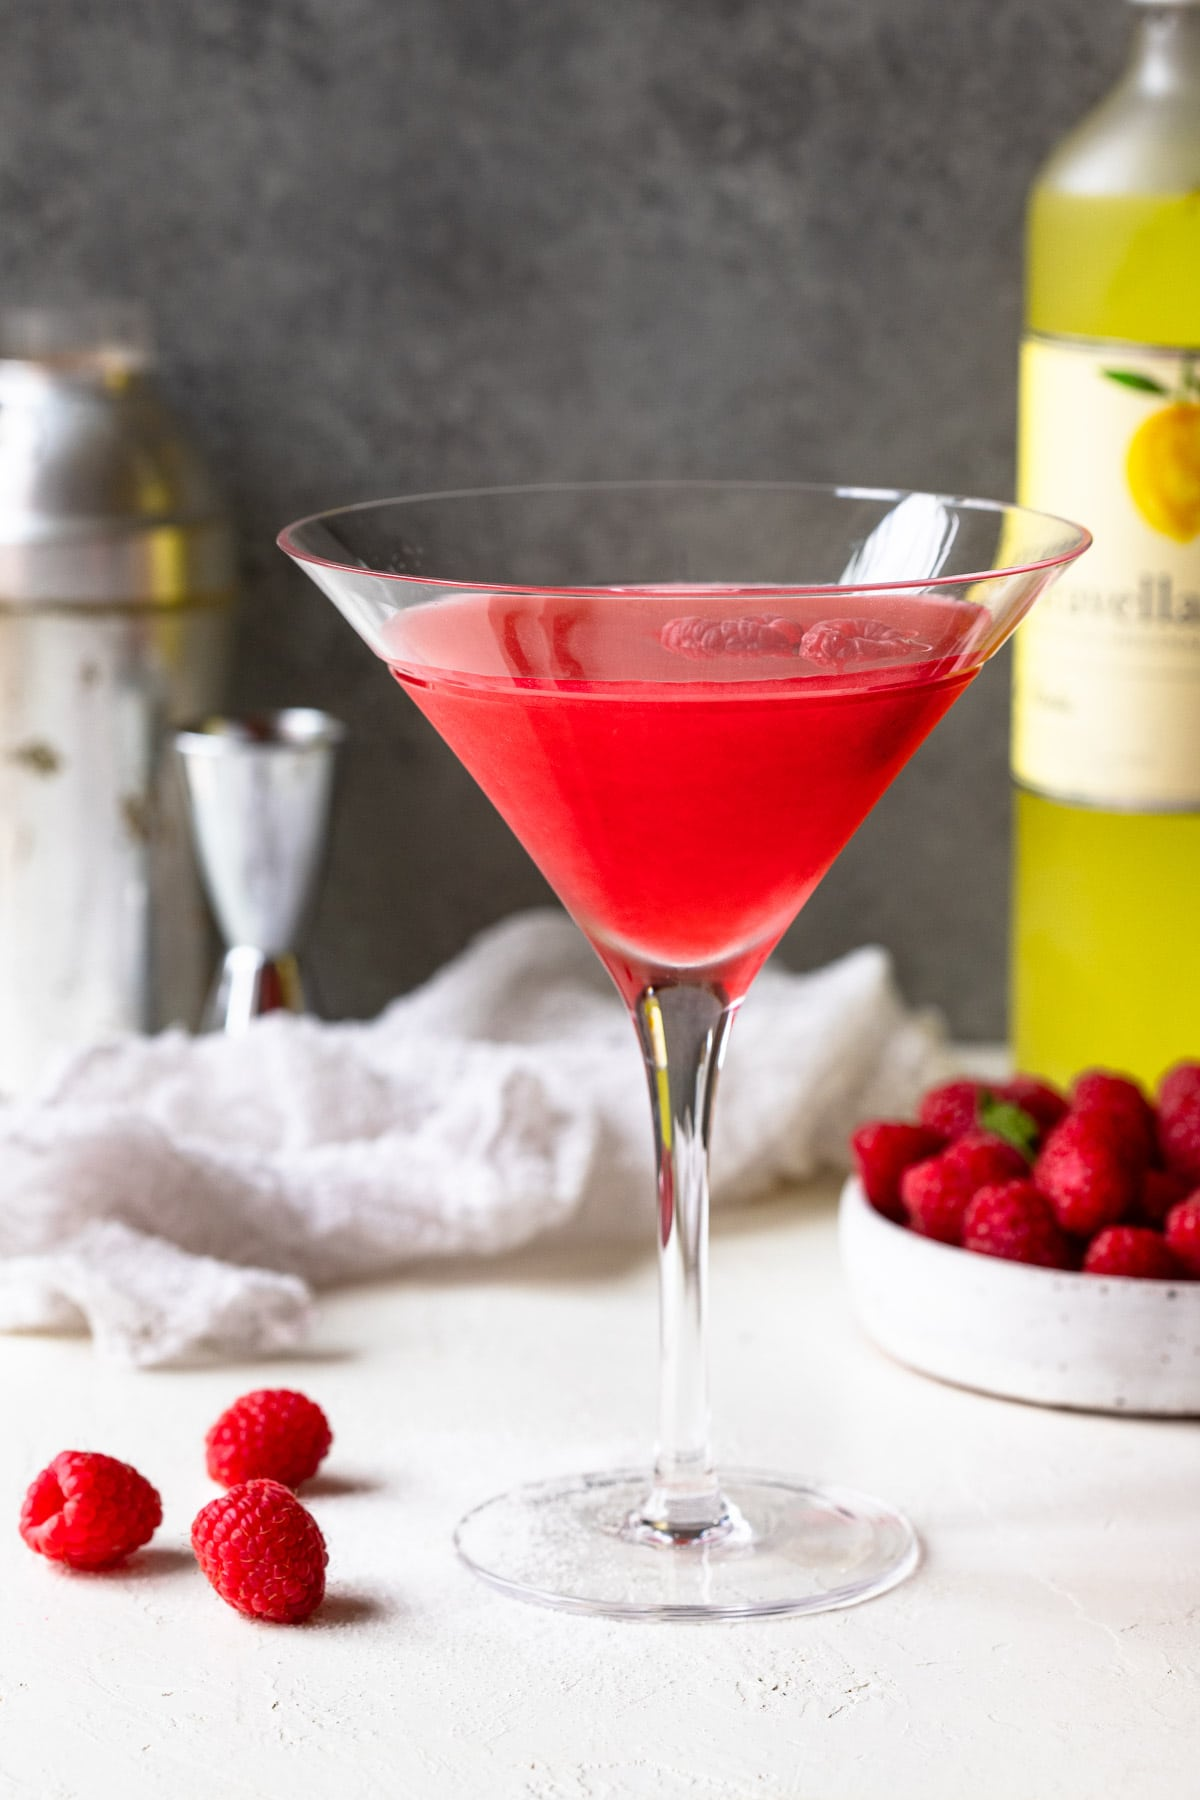 Raspberry limoncello vodka cocktail served in a martini glass.